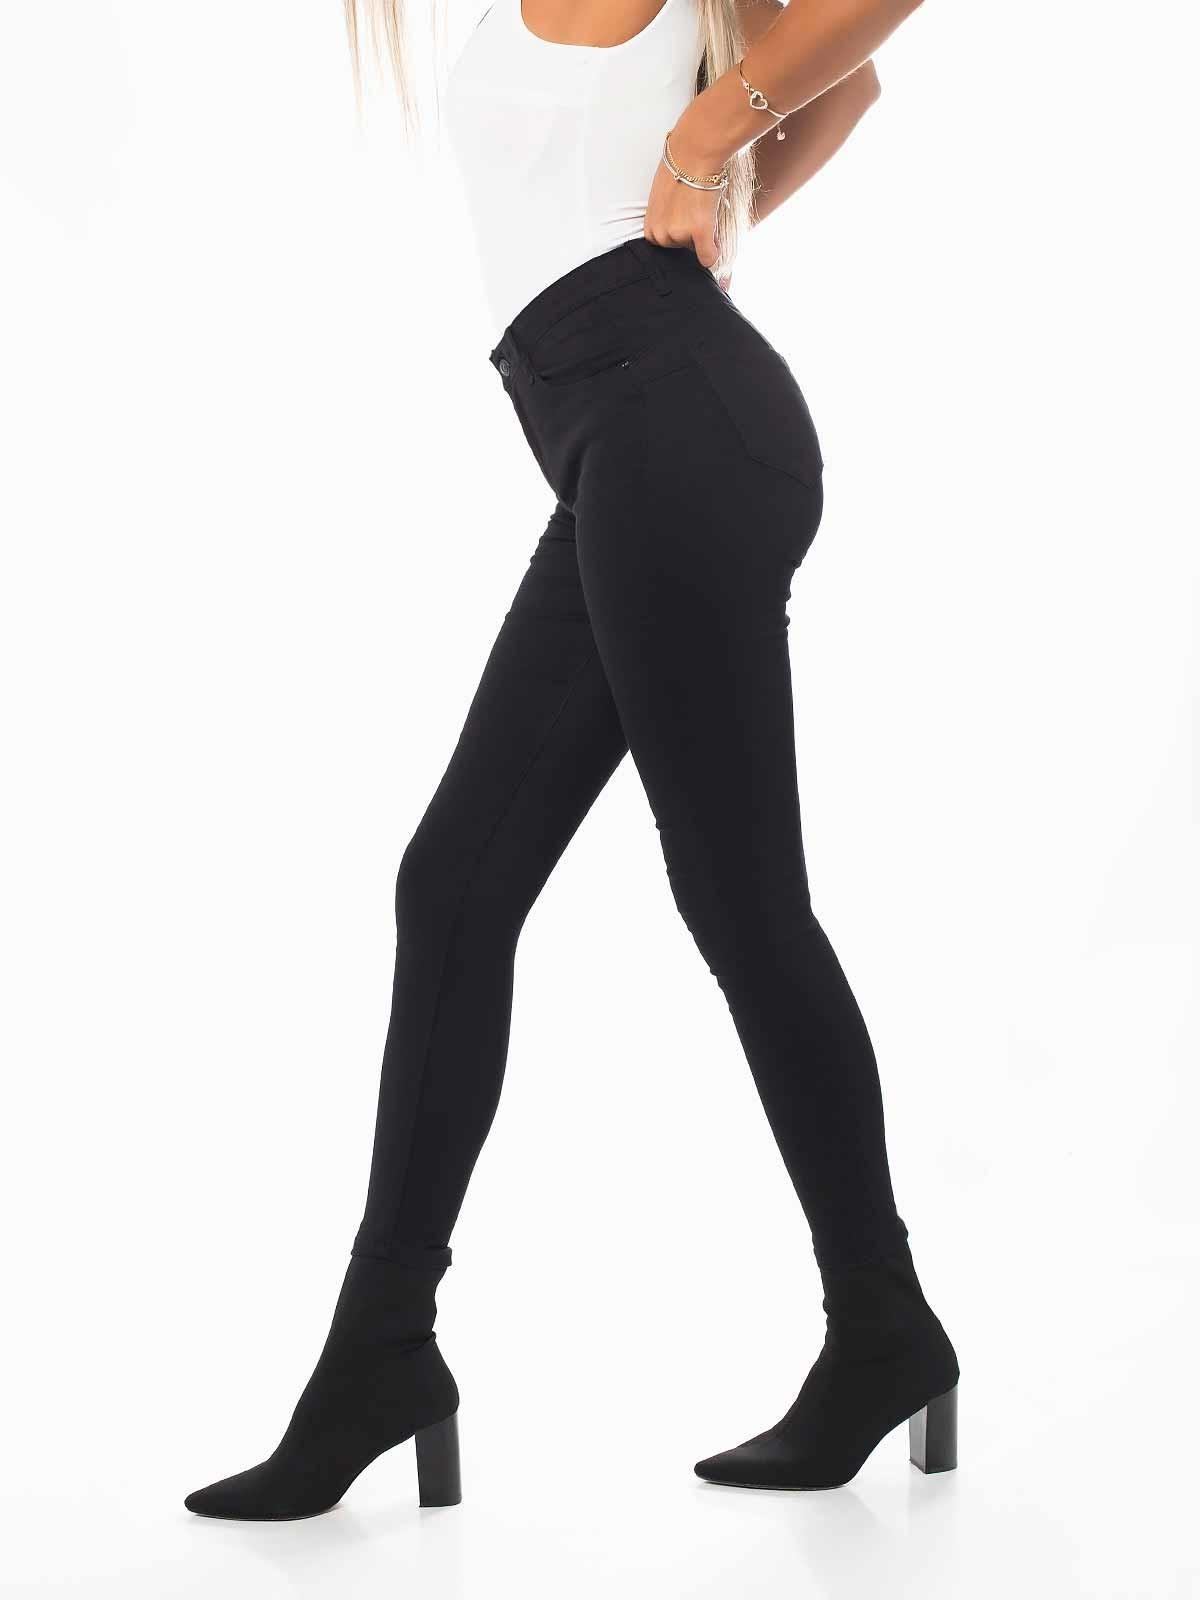 Pantalones negros push up skinny jeans